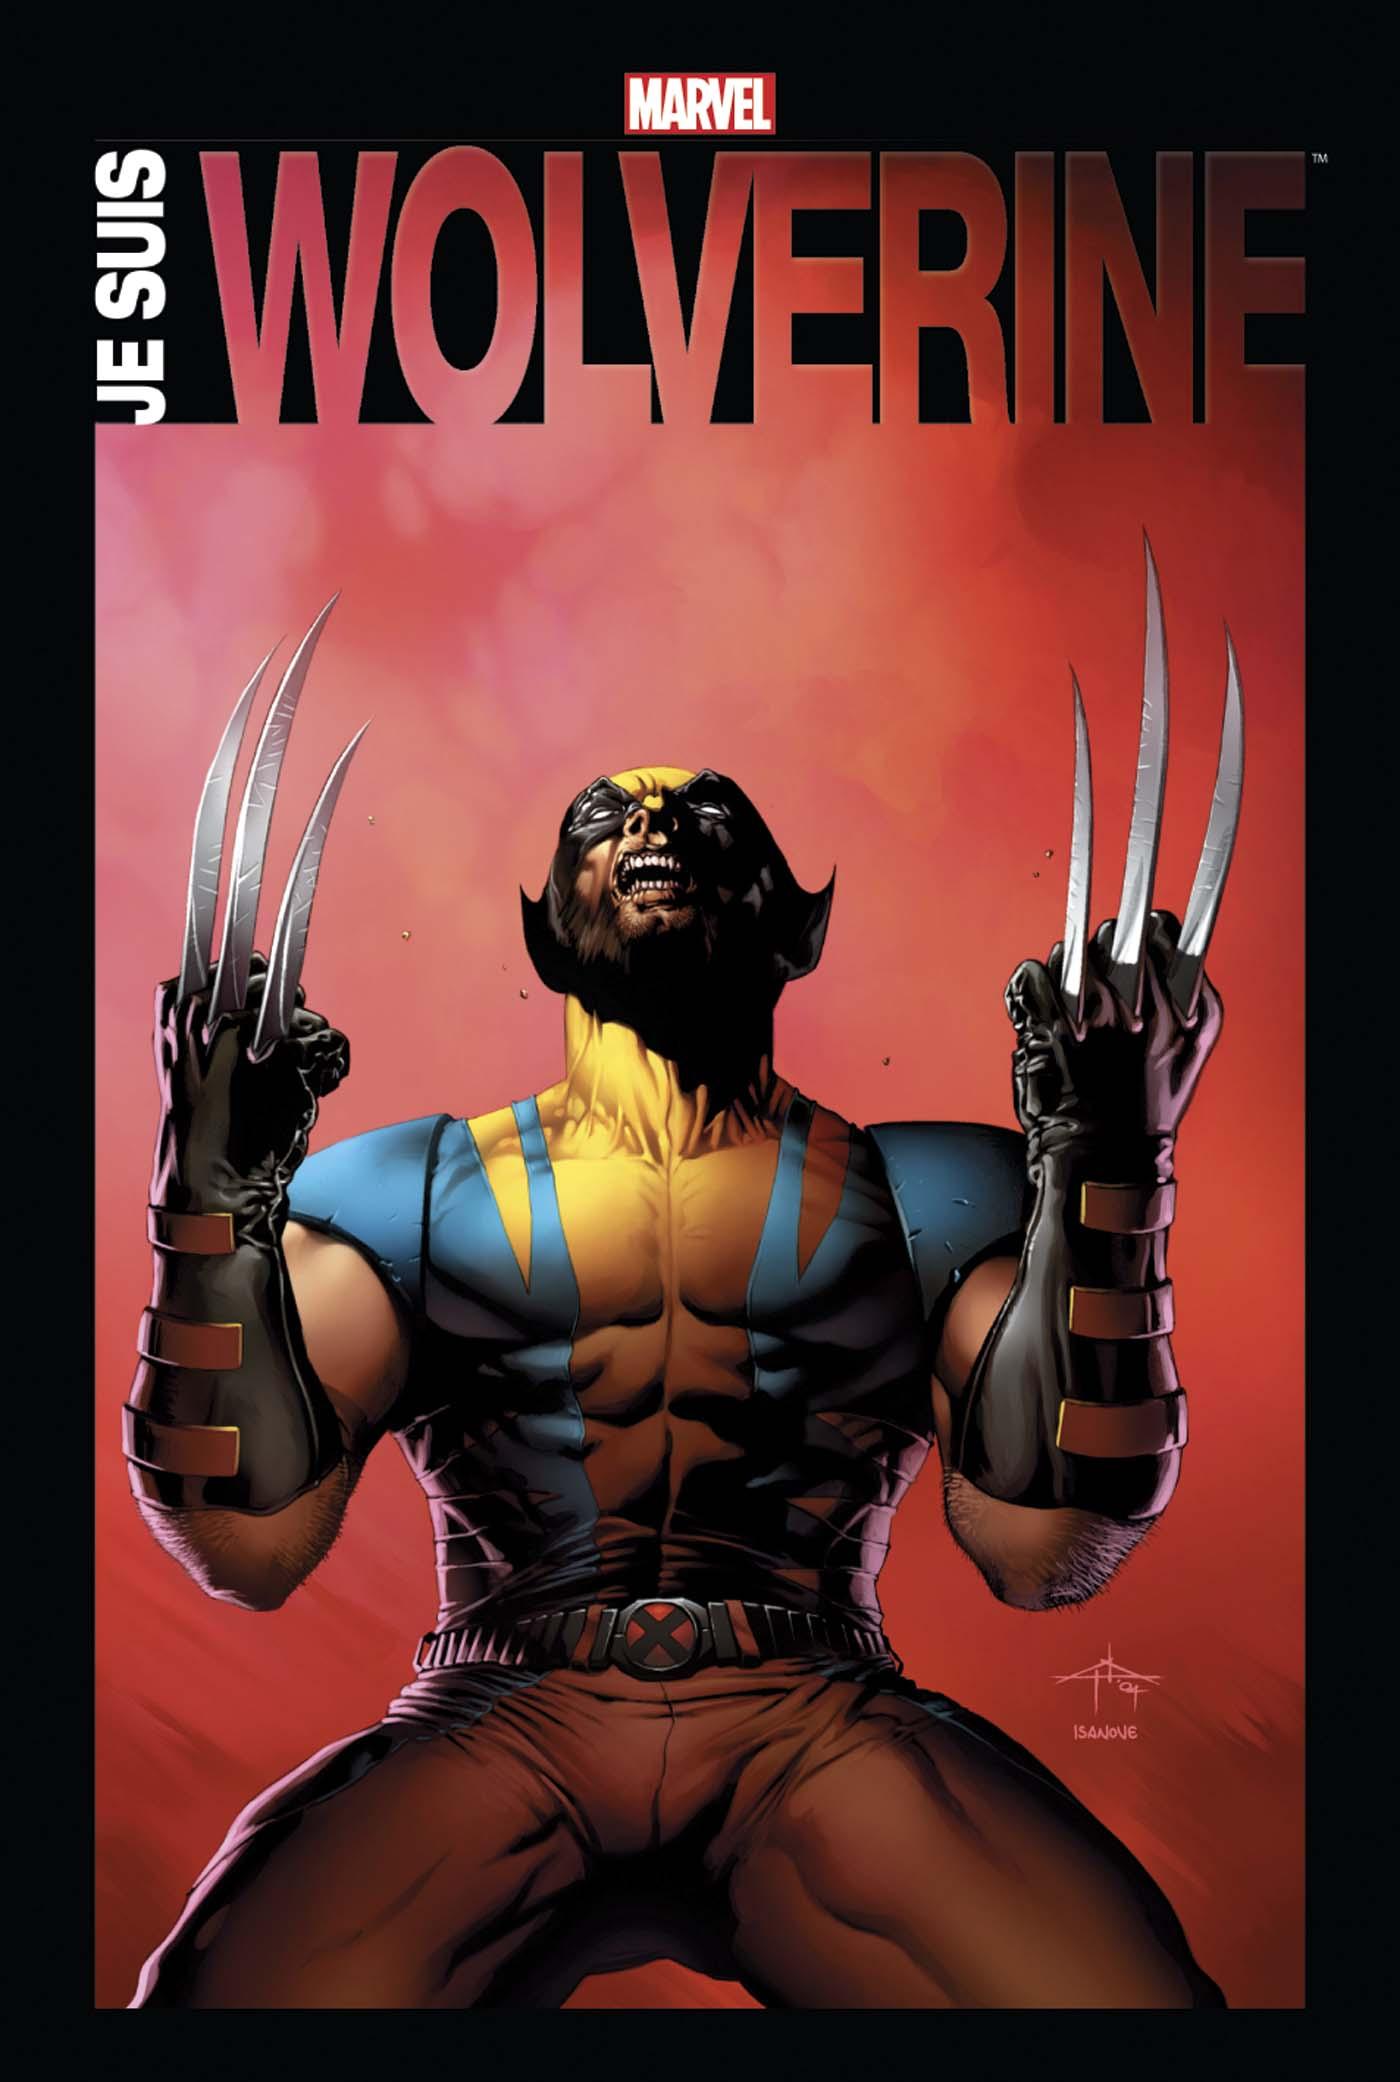 Je Suis Wolverine 1 - JE SUIS WOLVERINE